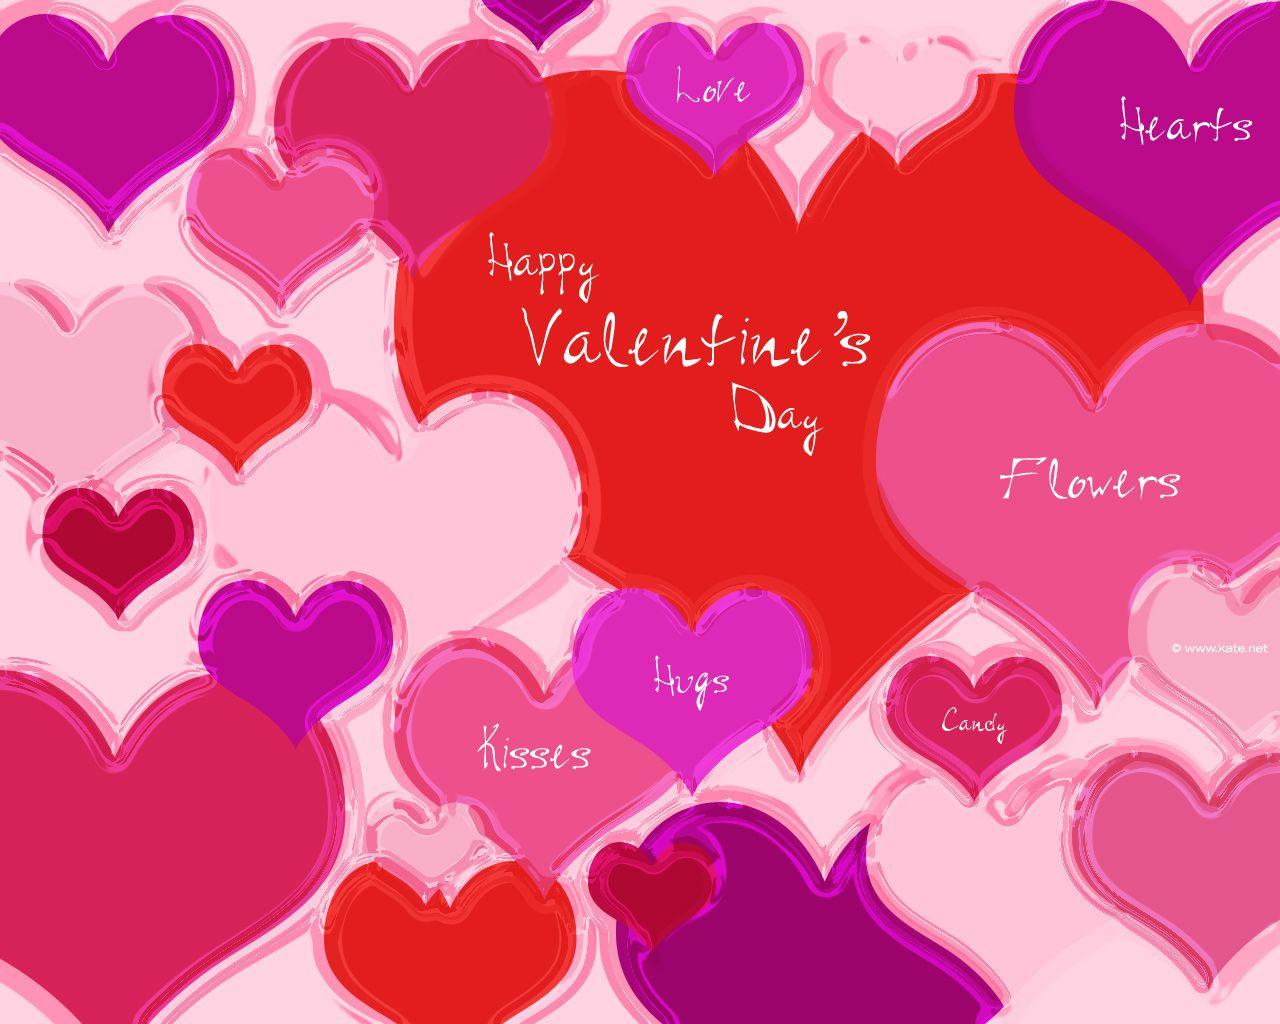 Happy Valentine S Day Holidays Pinterest Wallpaper